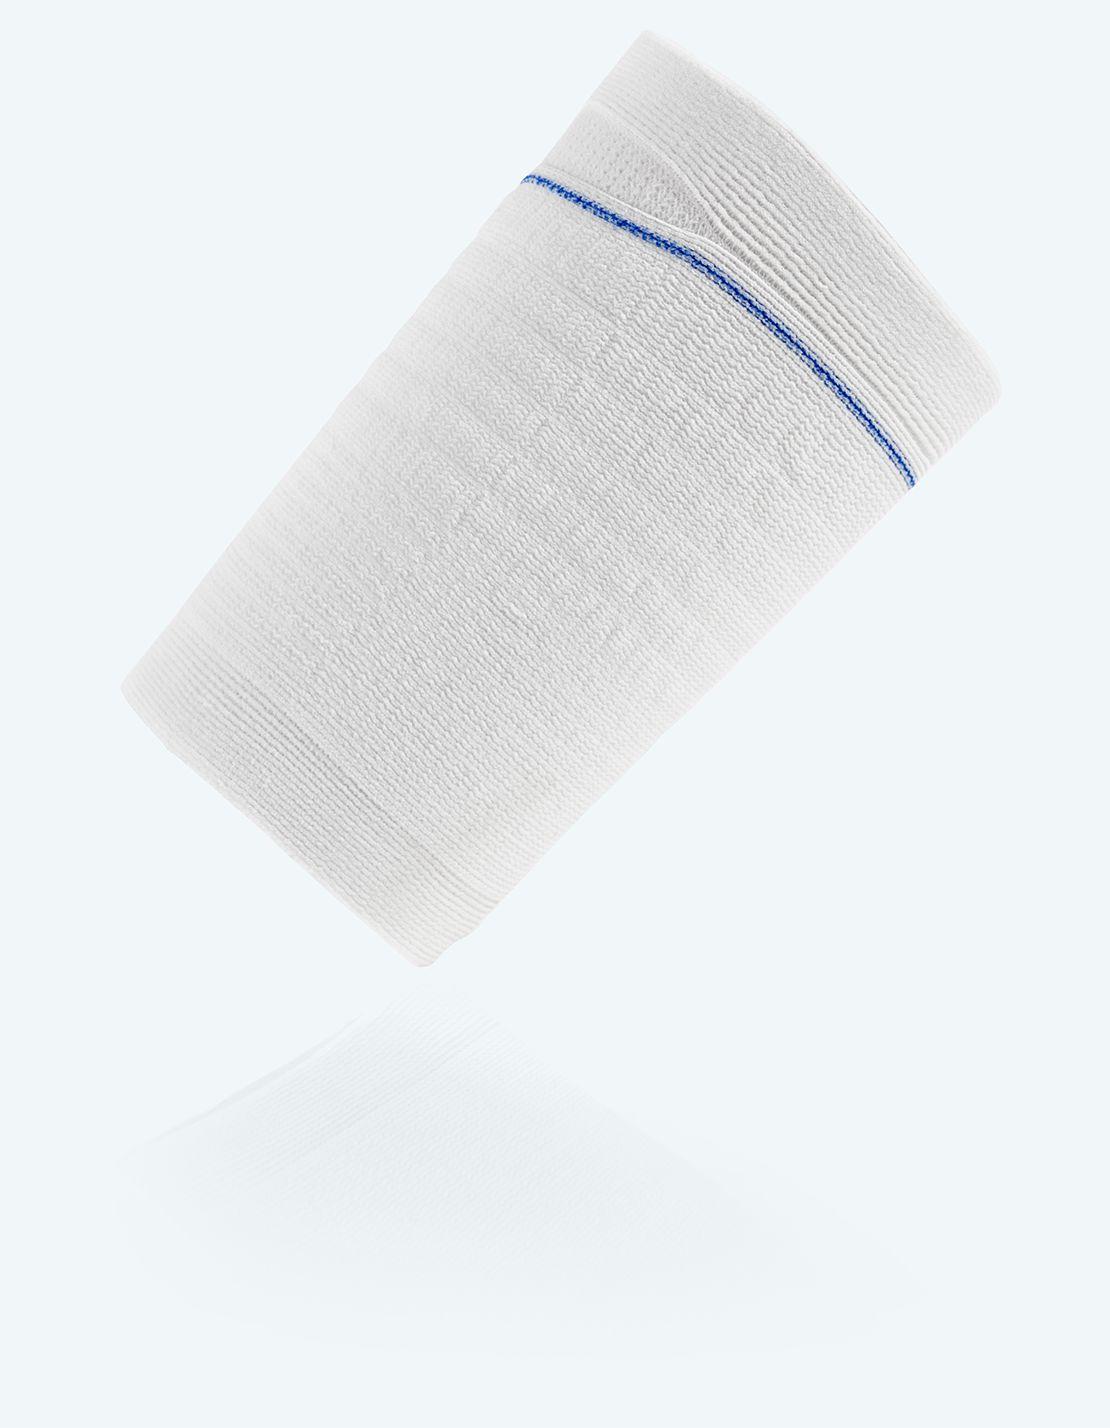 Ugo Fix Sleeve (leg bag holder)